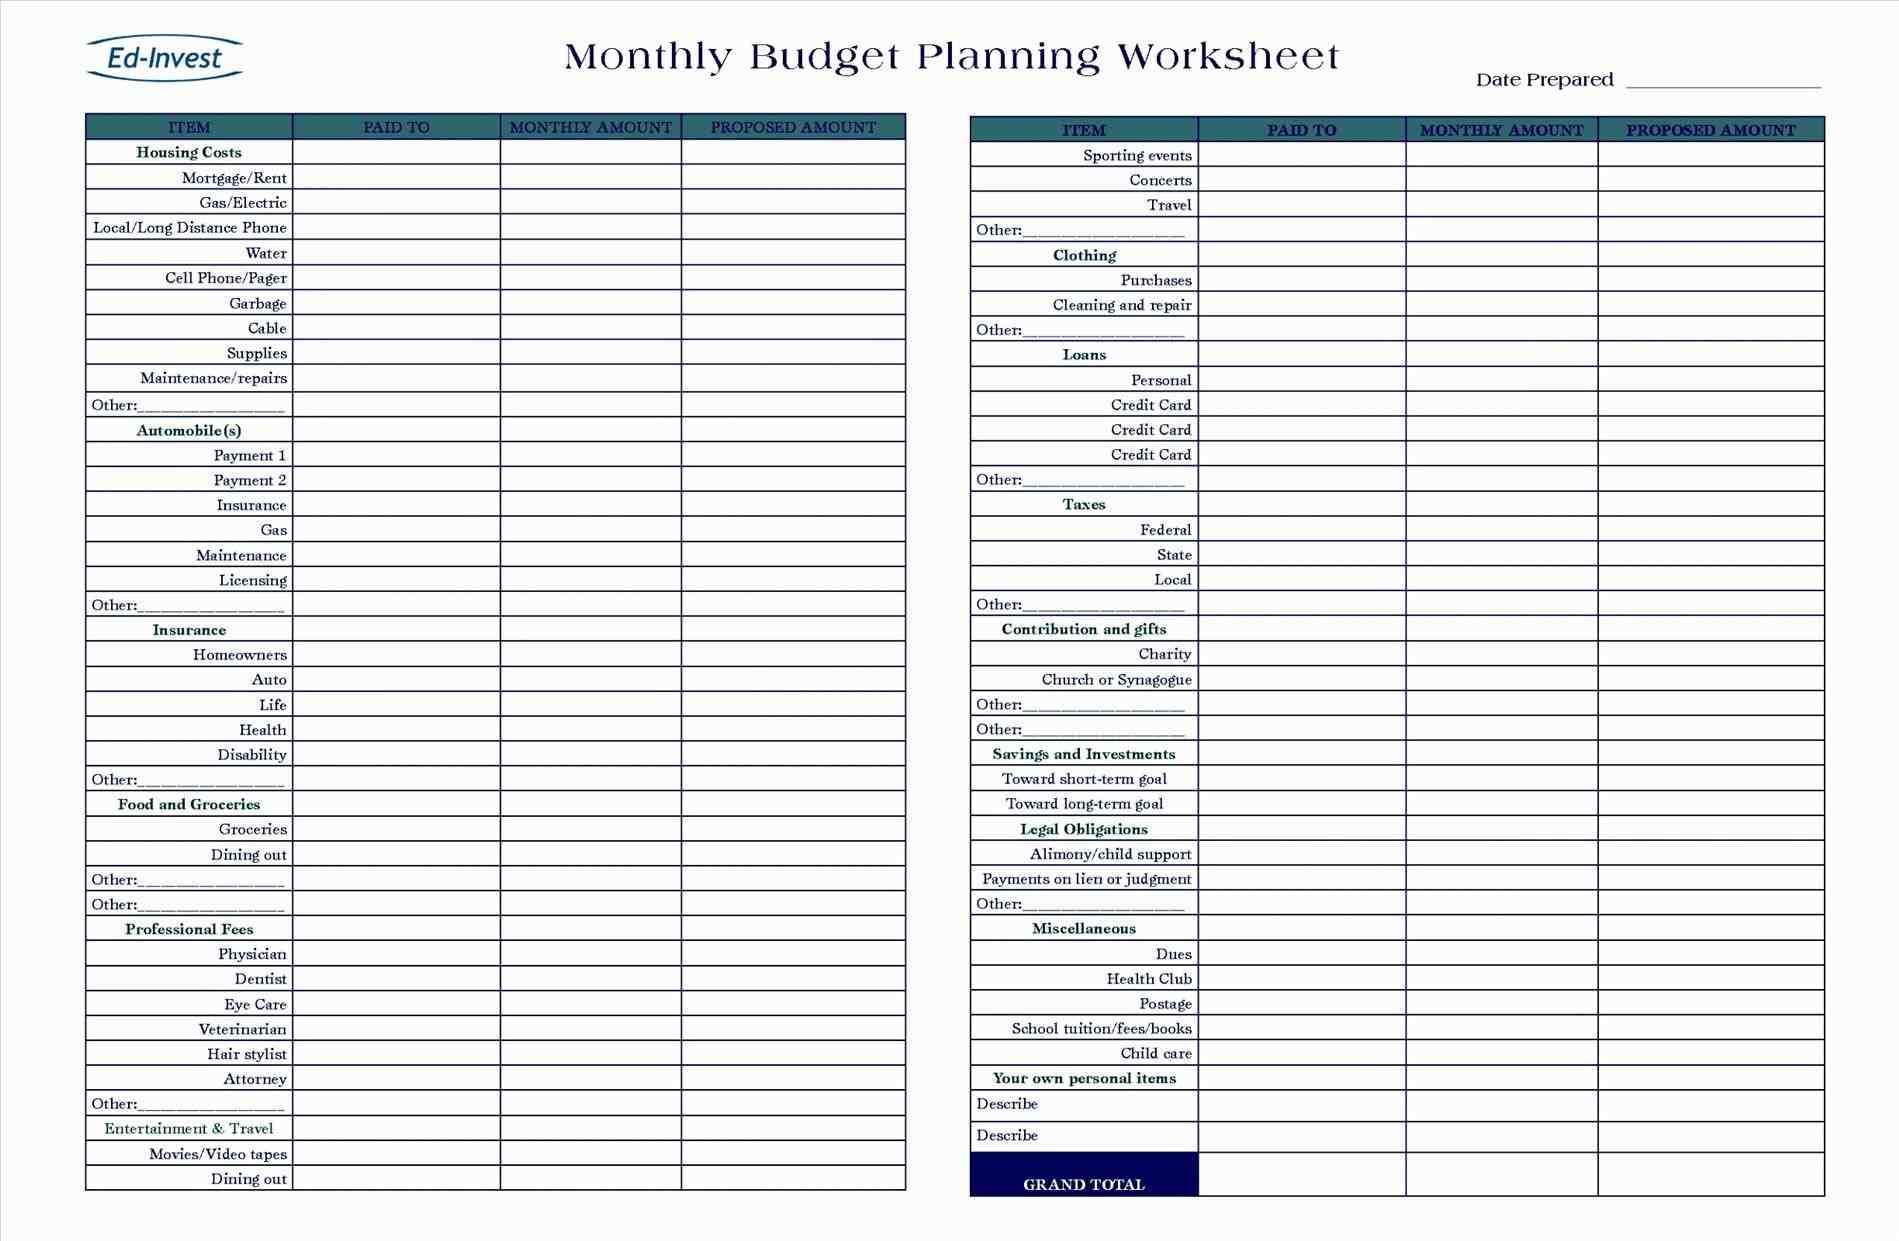 free u hynvyxrhhynvyxcom kanban Capacity Planning Excel Template Free card template excel and free u hynvyxrhhynvyxcom simple budget exceltemplates exceltemplatesrhexceltemplateus simple